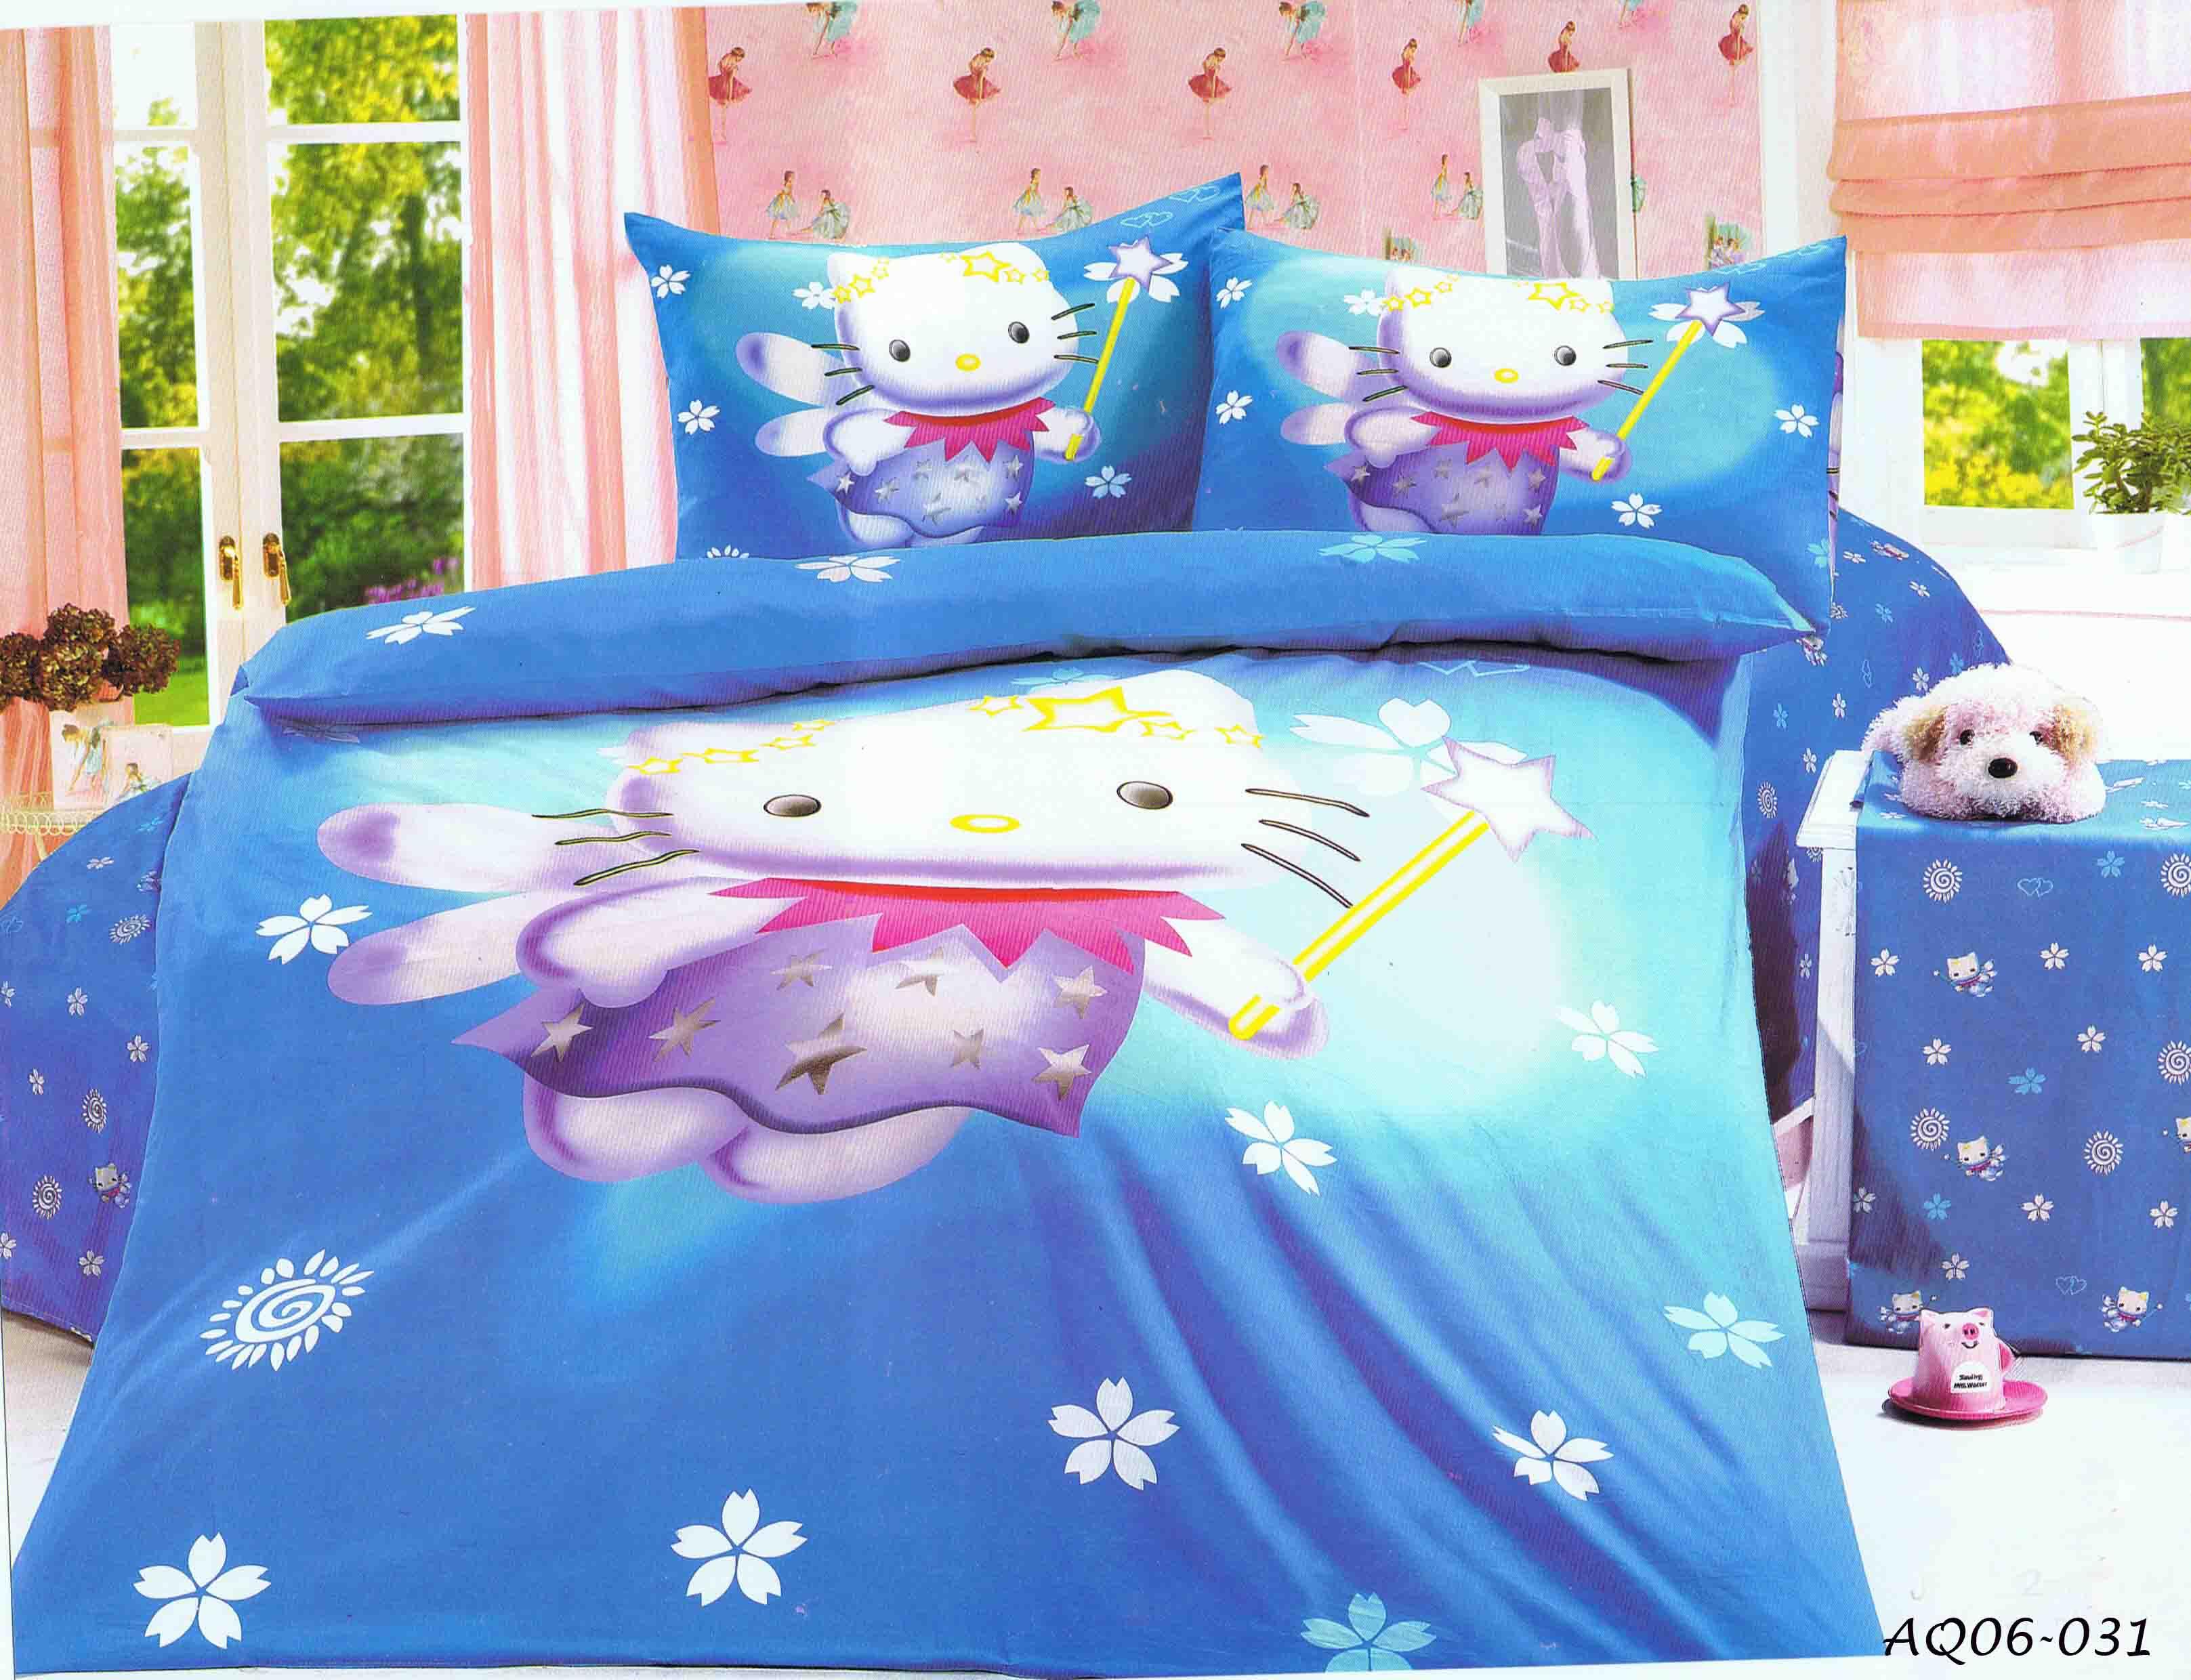 Hello kitty bedroom ireland - Pink Magic Hello Kitty Aq06 019 Blue Mage Hello Kitty Aq06 031 Loving Hello Kitty Aq06 056